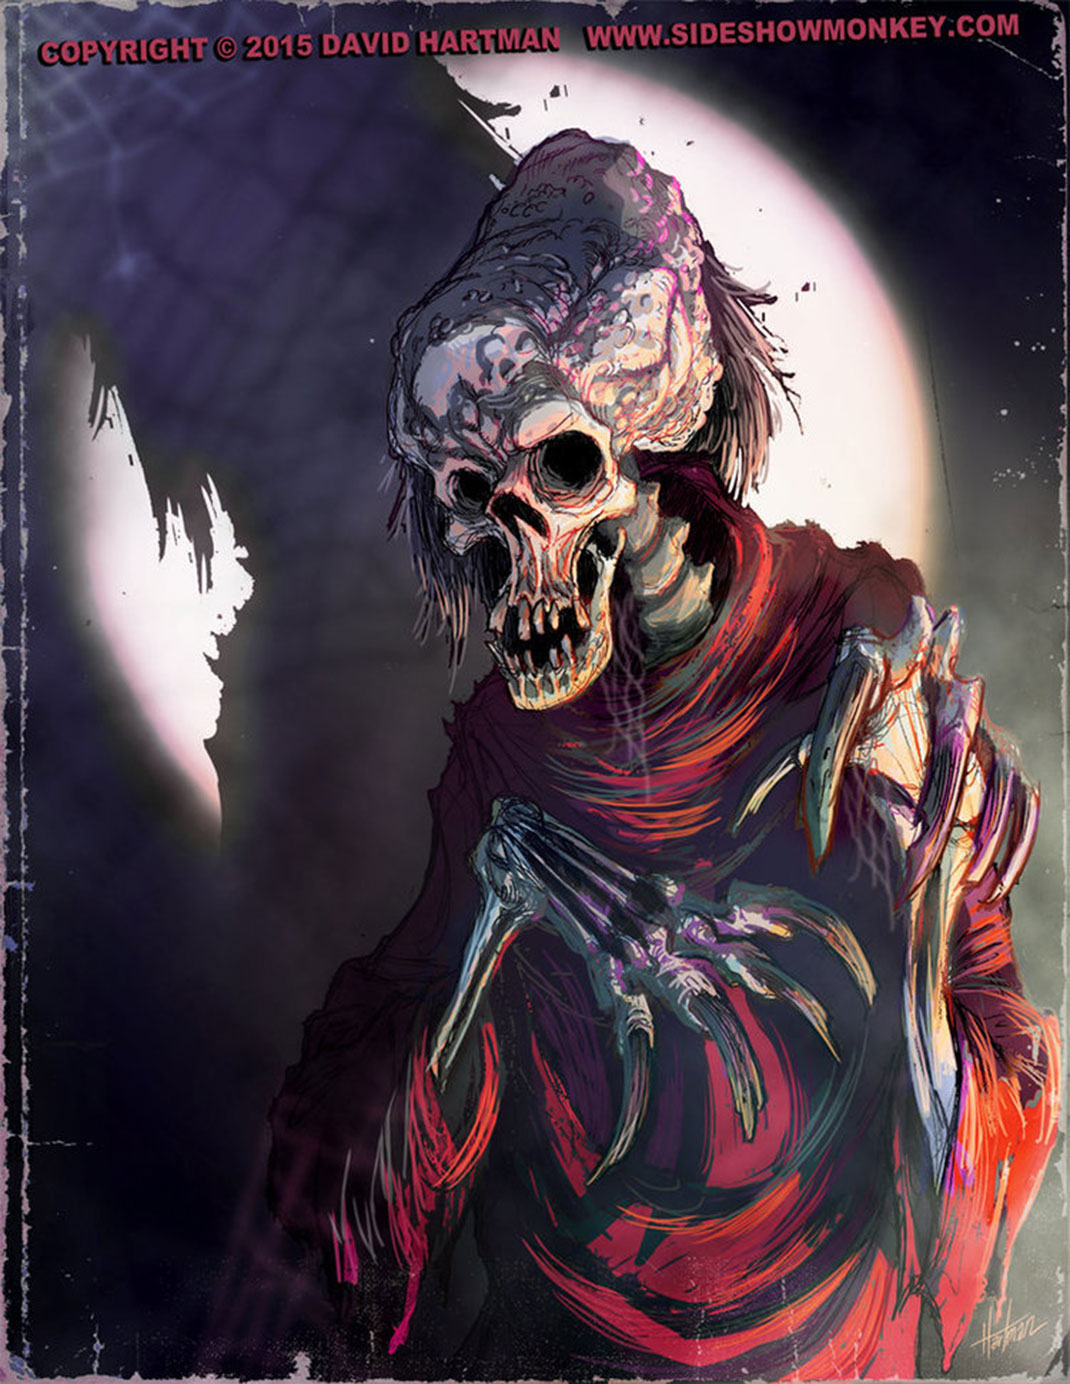 skeleton_webs_by_hartman_by_sideshowmonkey-d8dxx2n